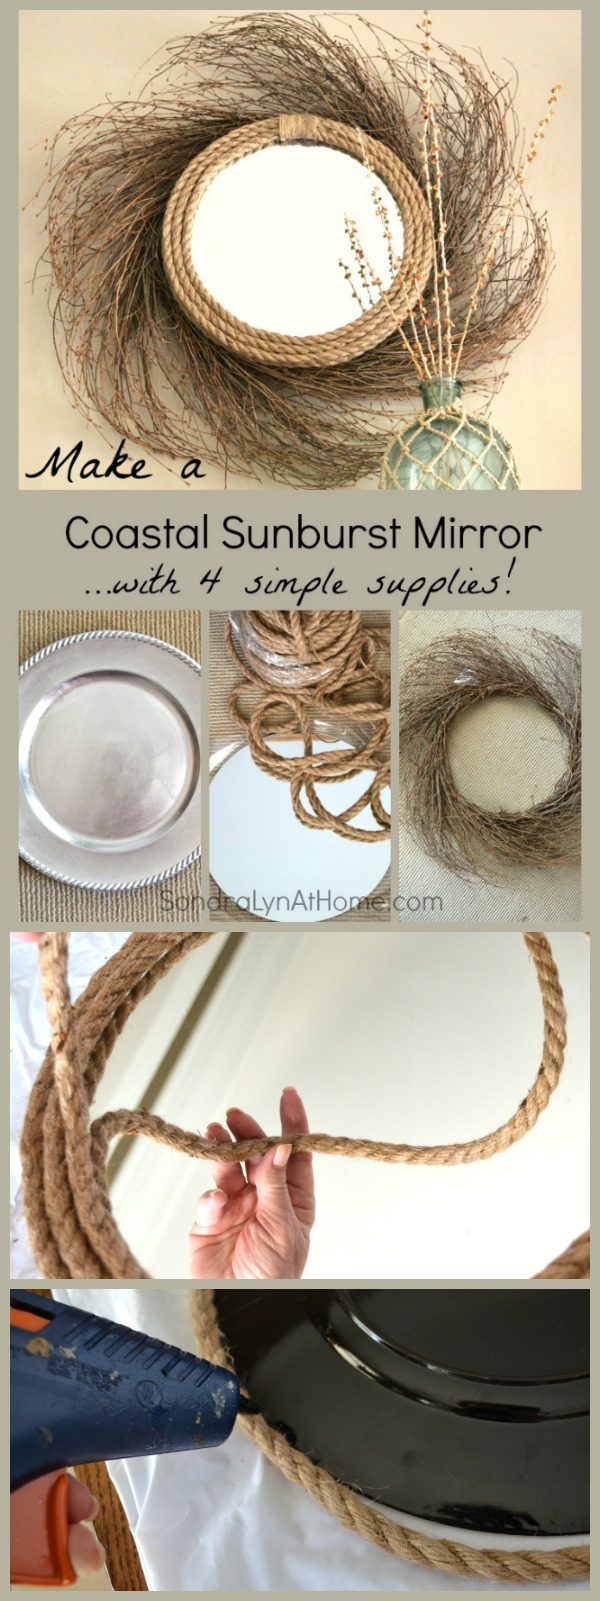 Make a Sunburst Mirror with a Coastal Vibe using 4 simple materials and a glue gun! - Sondra Lyn at Home.com